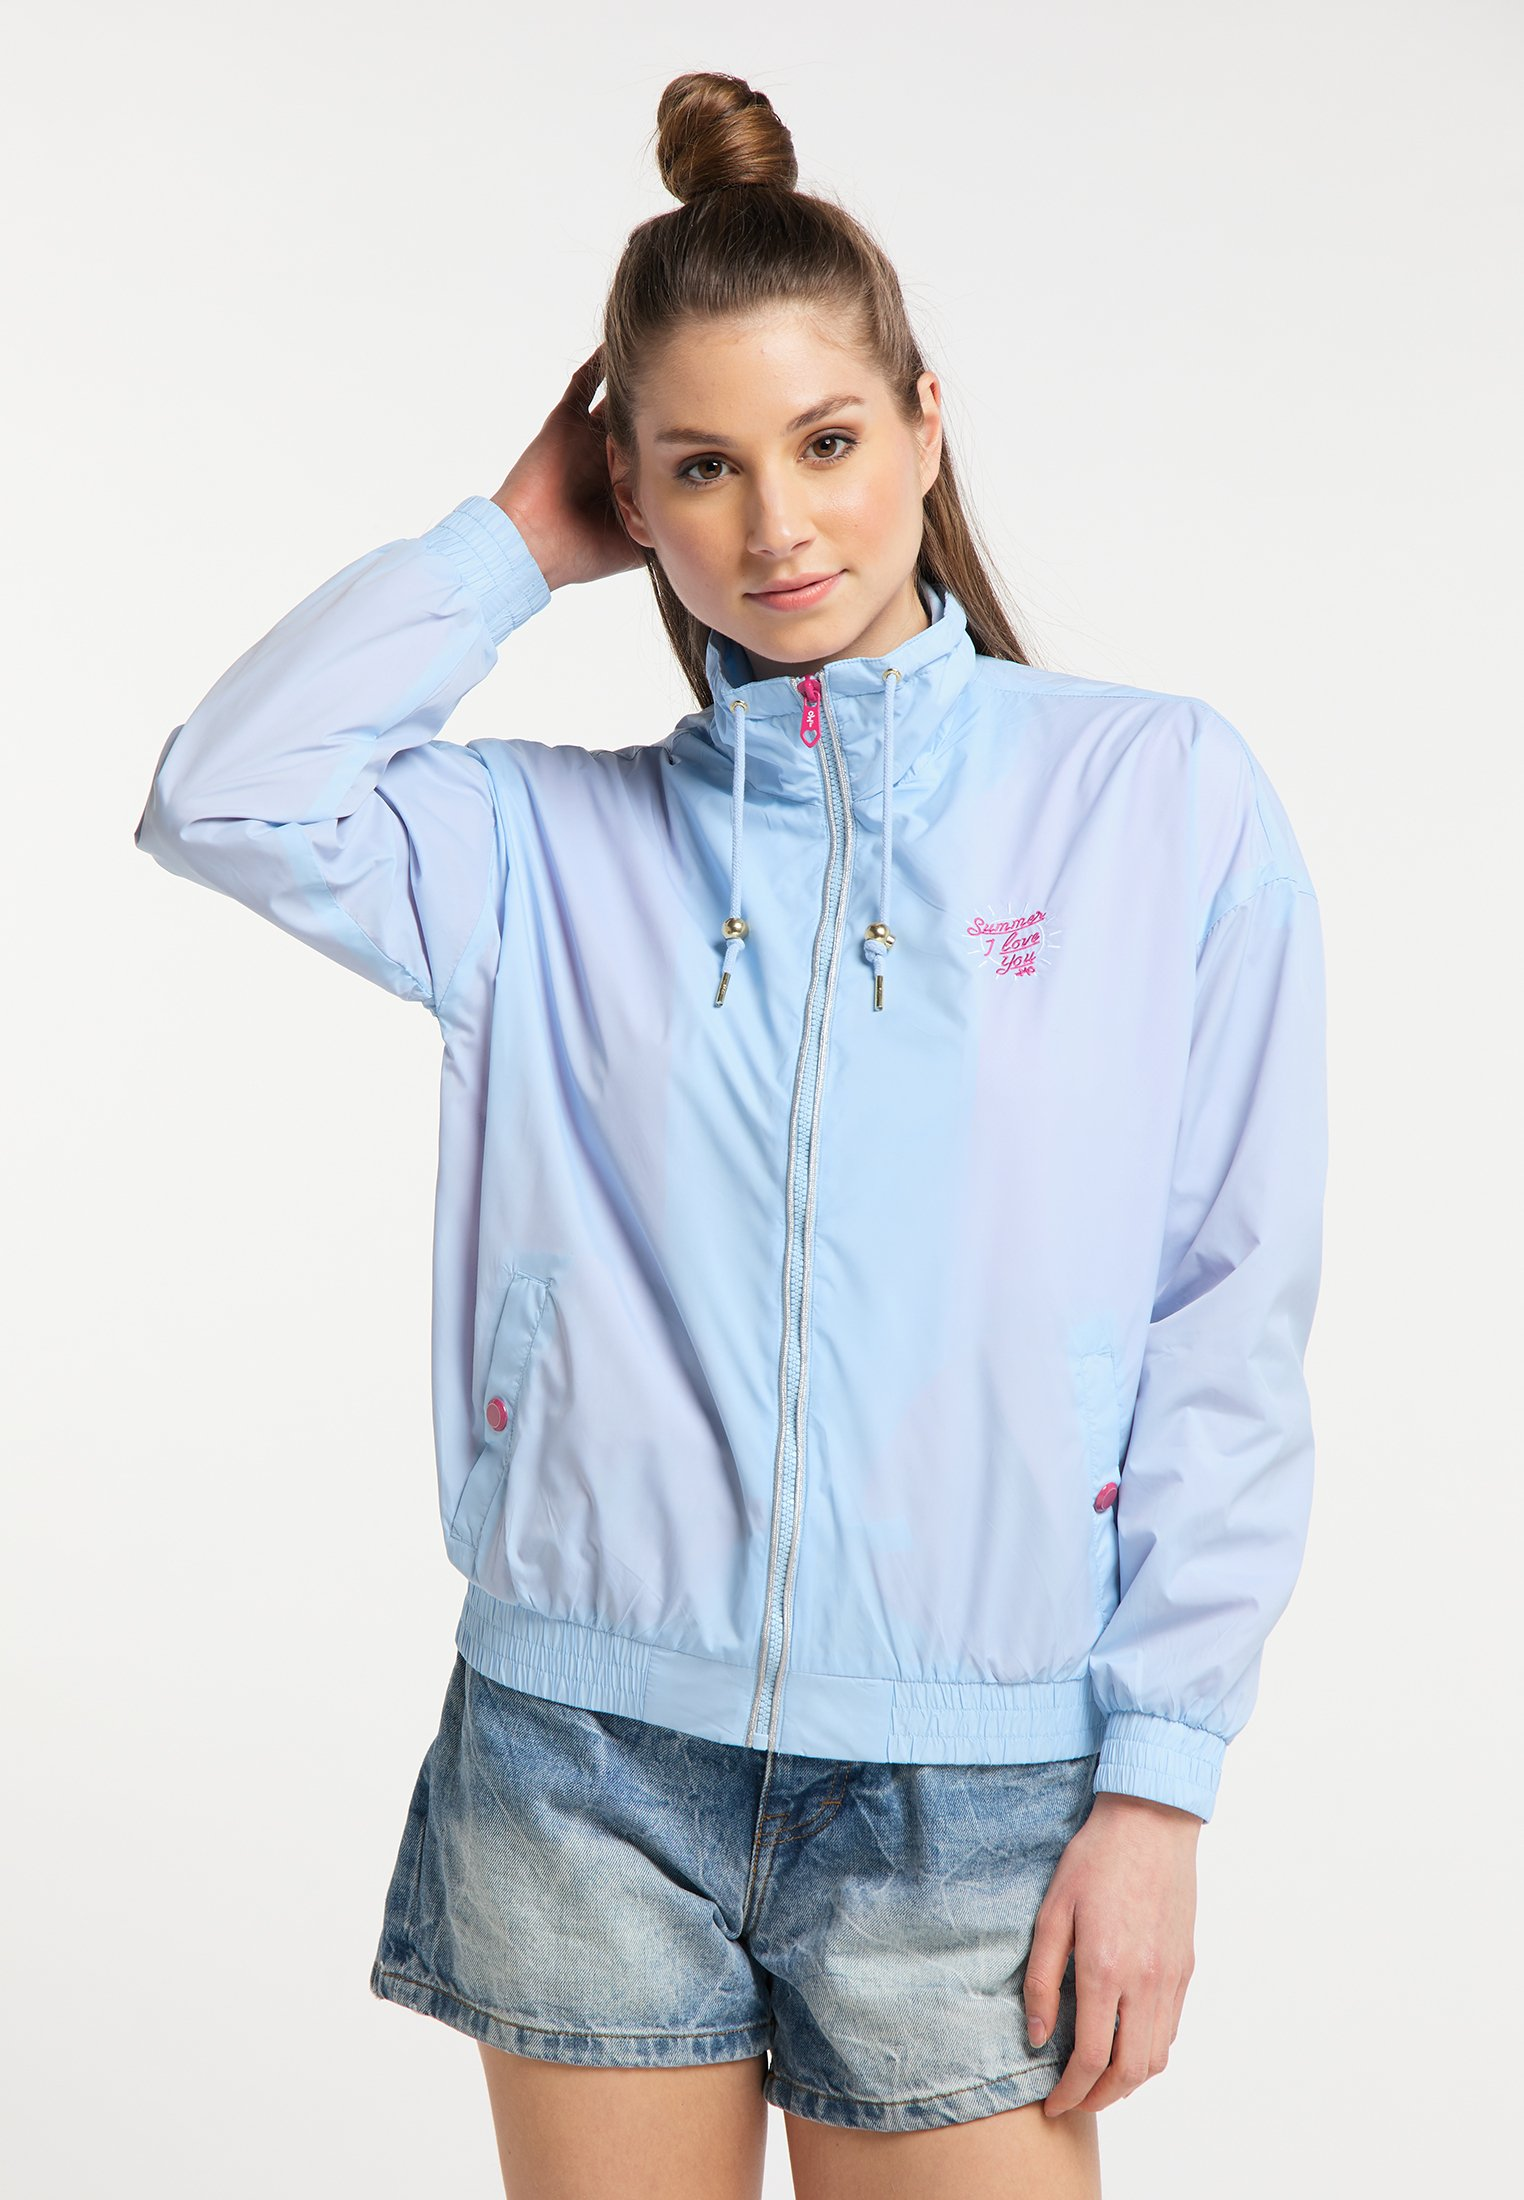 Best Place Women's Clothing myMo WINDBREAKER Summer jacket light blue jhT7WaRzl